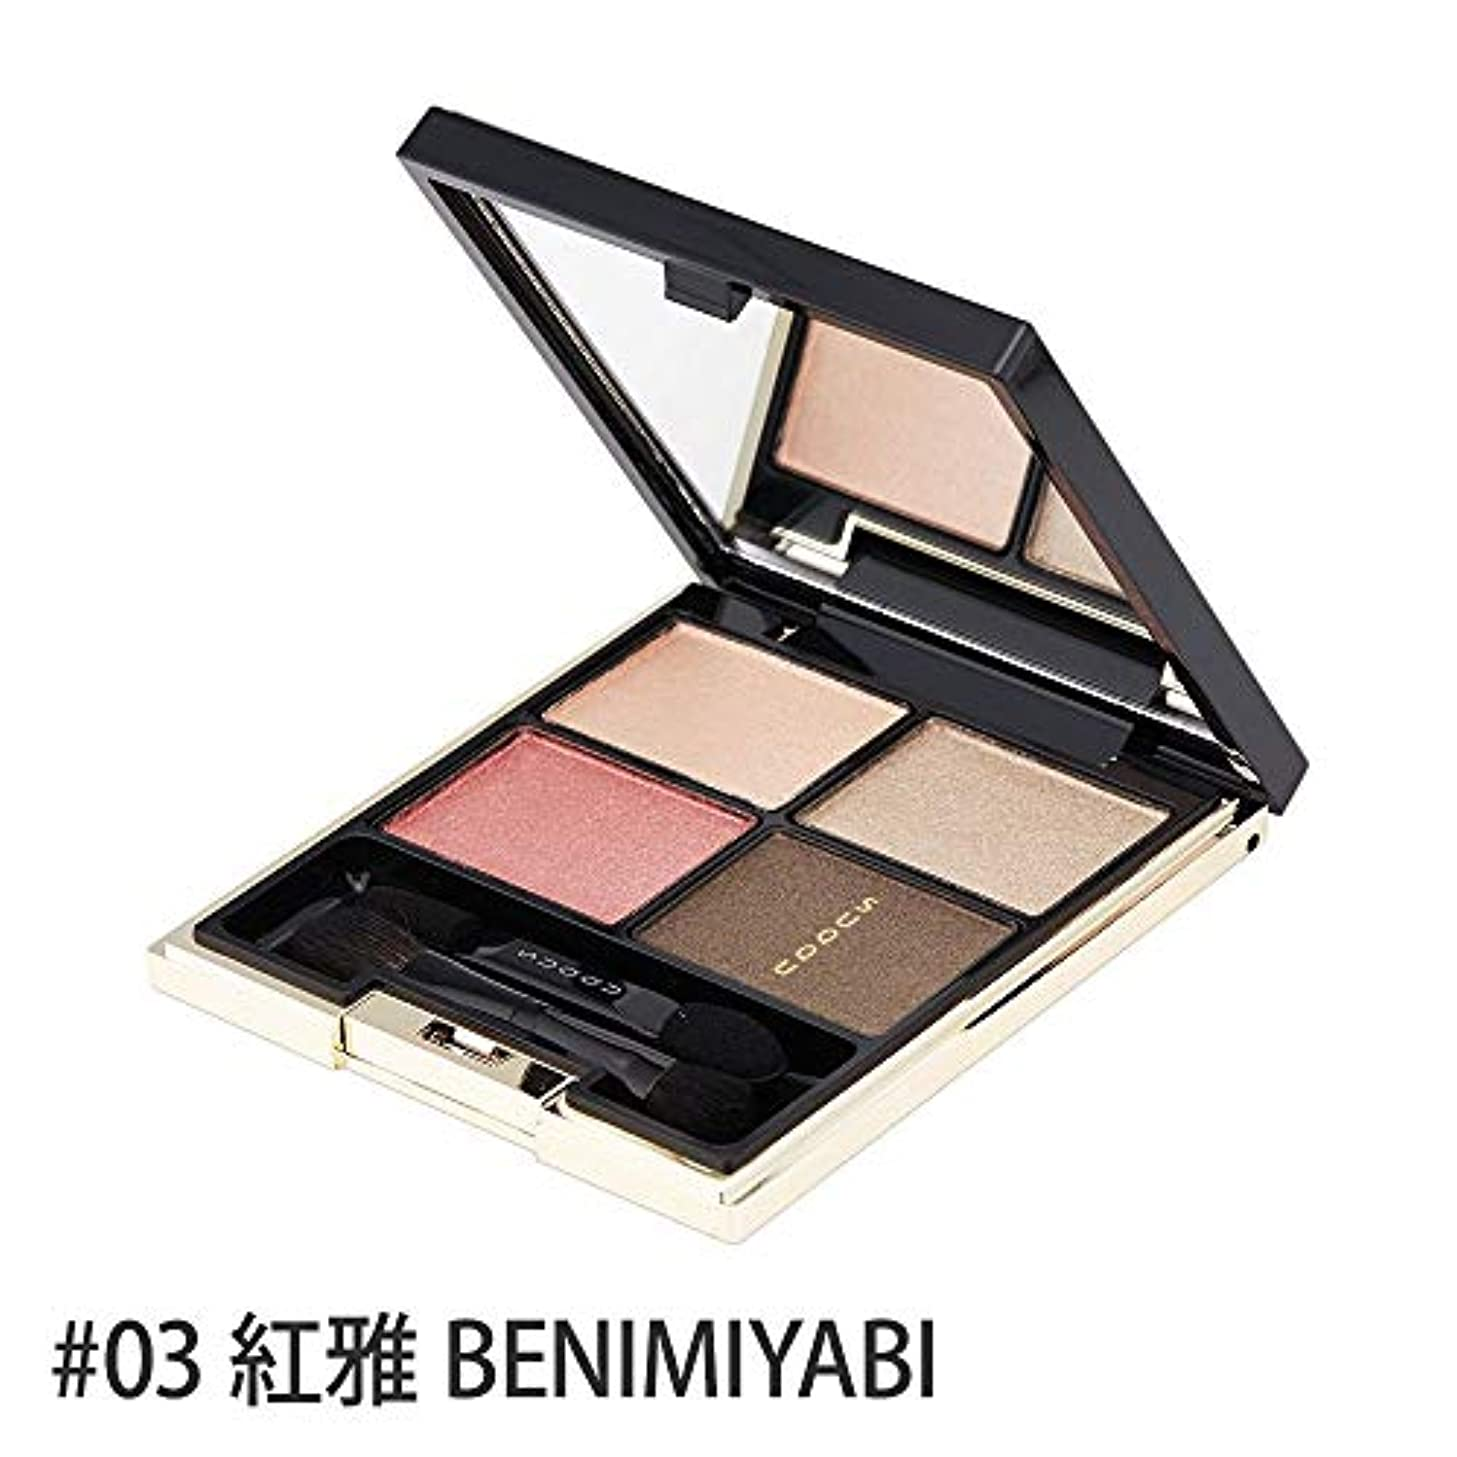 SUQQU(スック) デザイニング カラー アイズ #03 紅雅(BENIMIYABI) [並行輸入品]